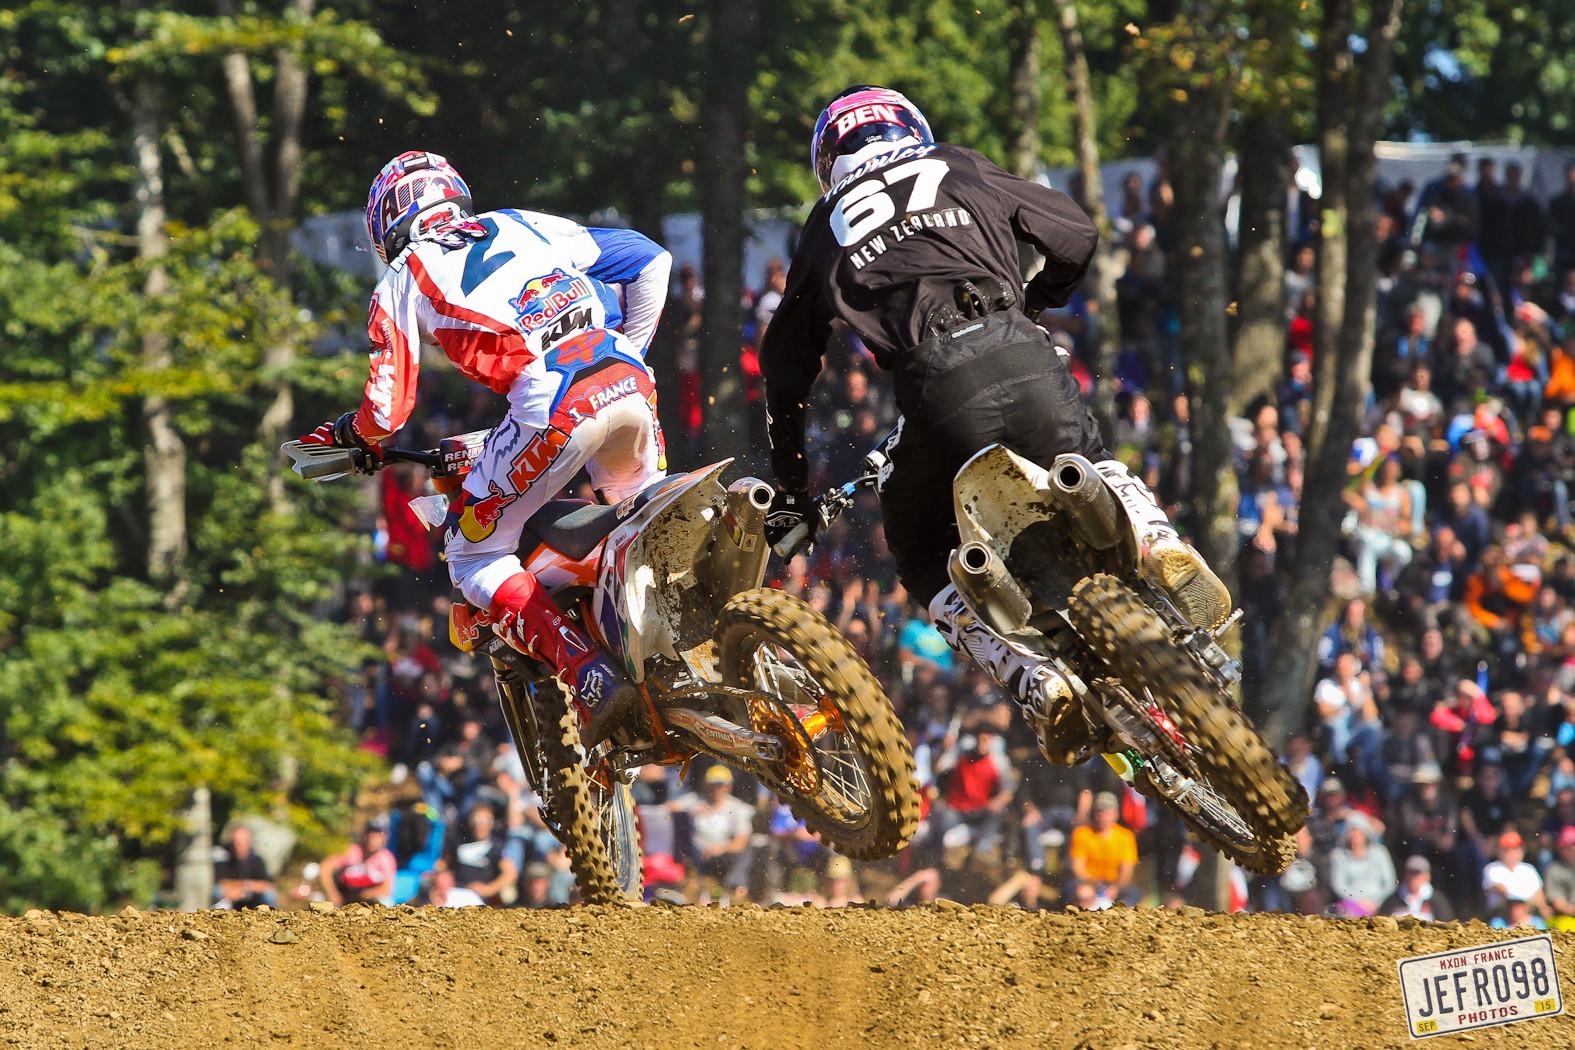 Musquin & Townley - Photo Blast: MXoN Sunday racing - Motocross Pictures - Vital MX